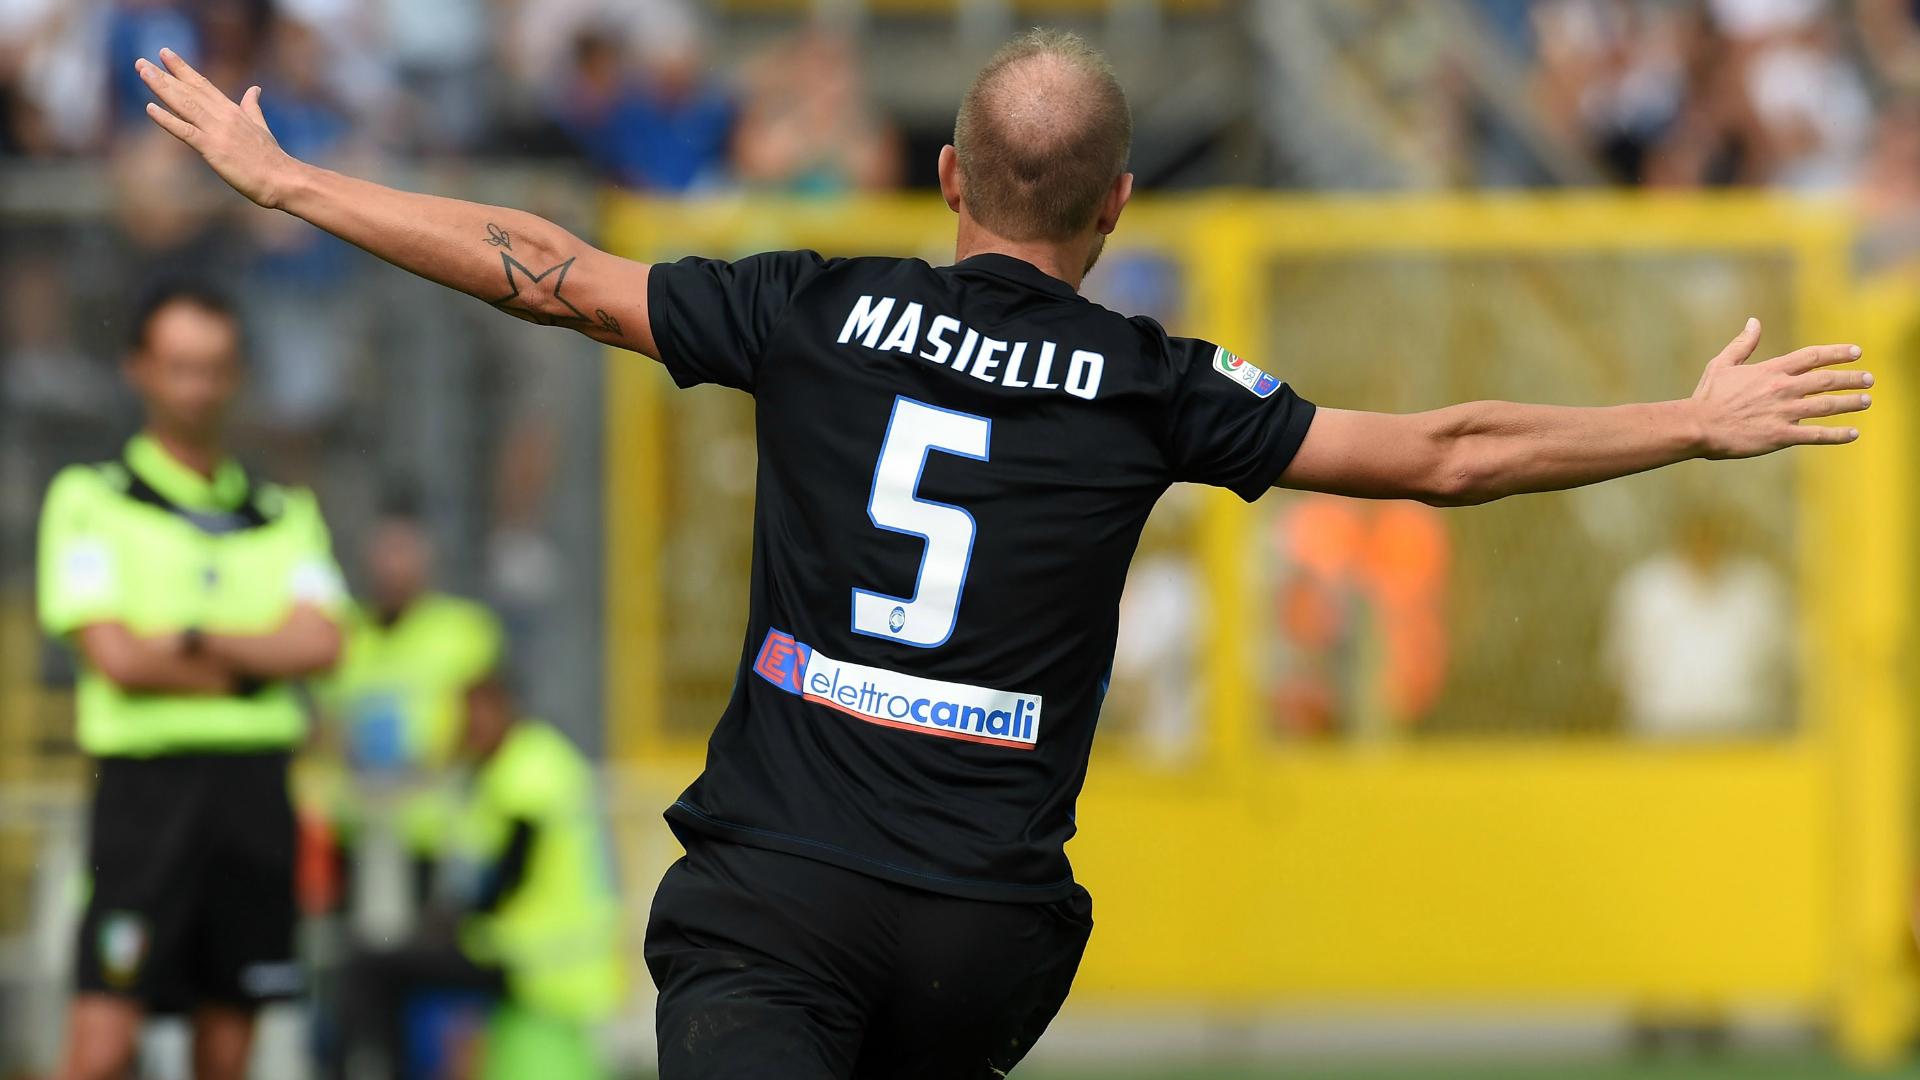 Gara senza storia, l'Atalanta batte il Cagliari per 2-0